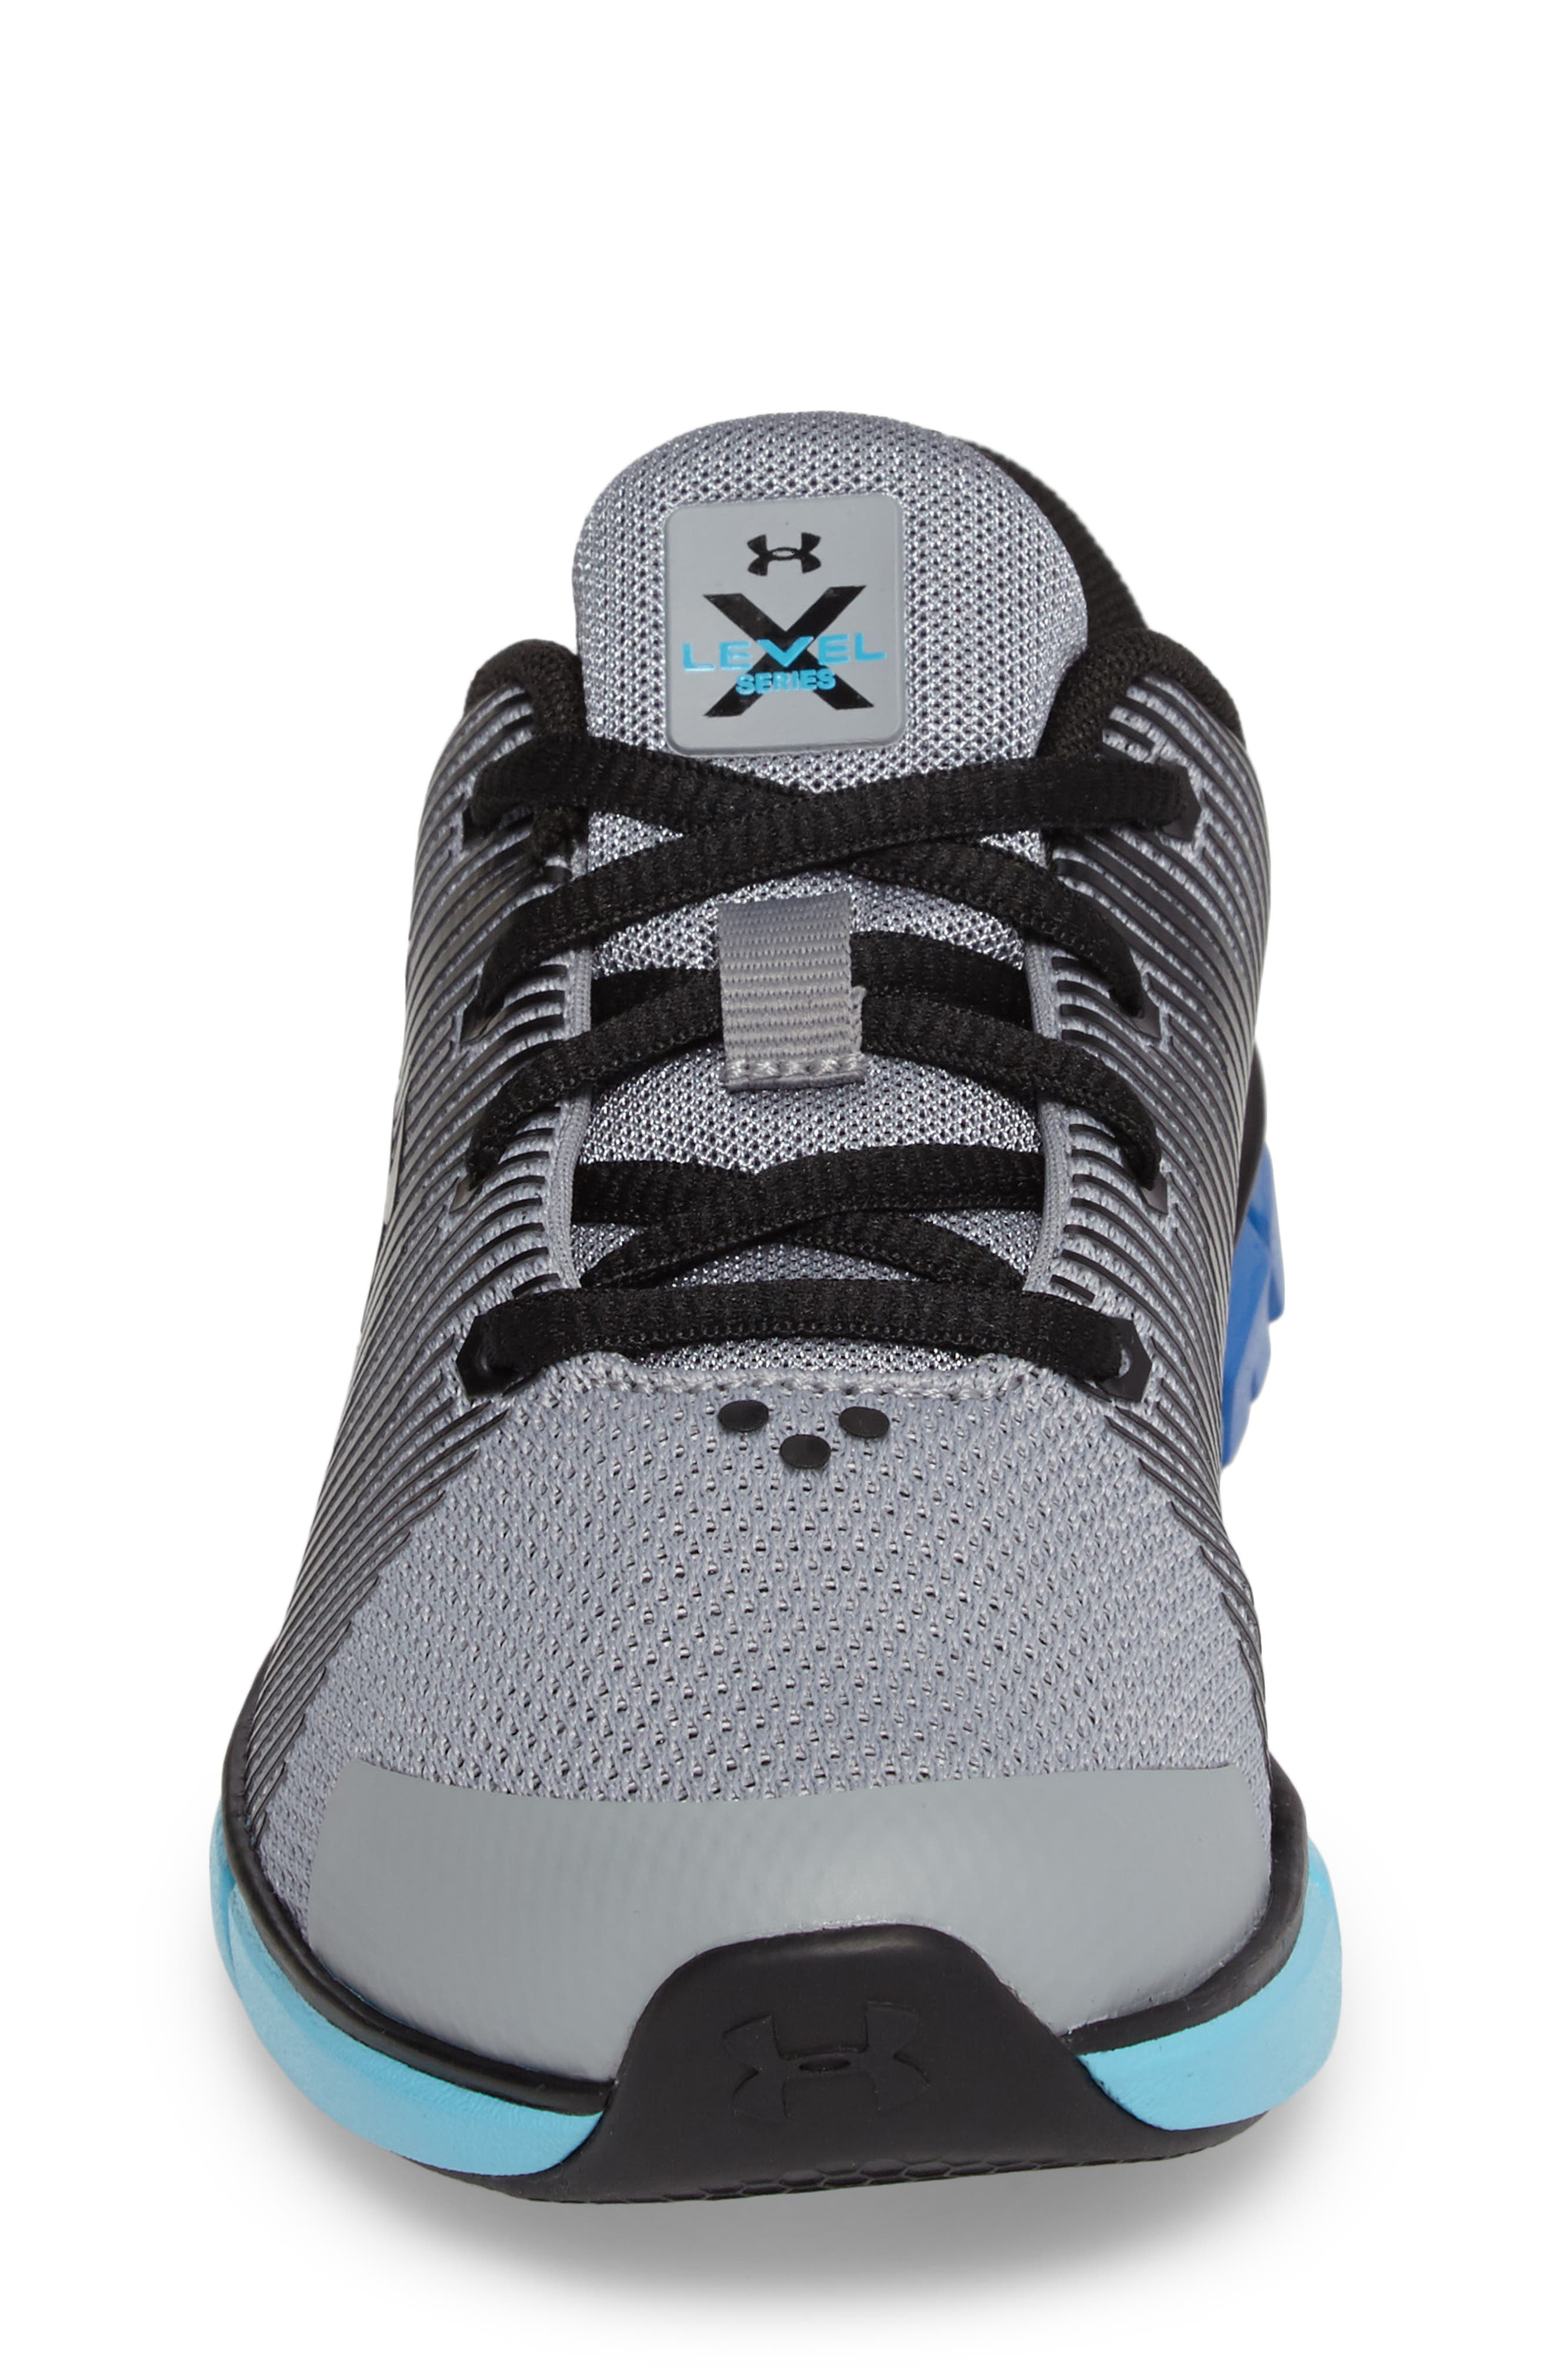 Alternate Image 4  - Under Armour BGS X Level Scramjet Running Shoe (Toddler, Little Kid & Big Kid)